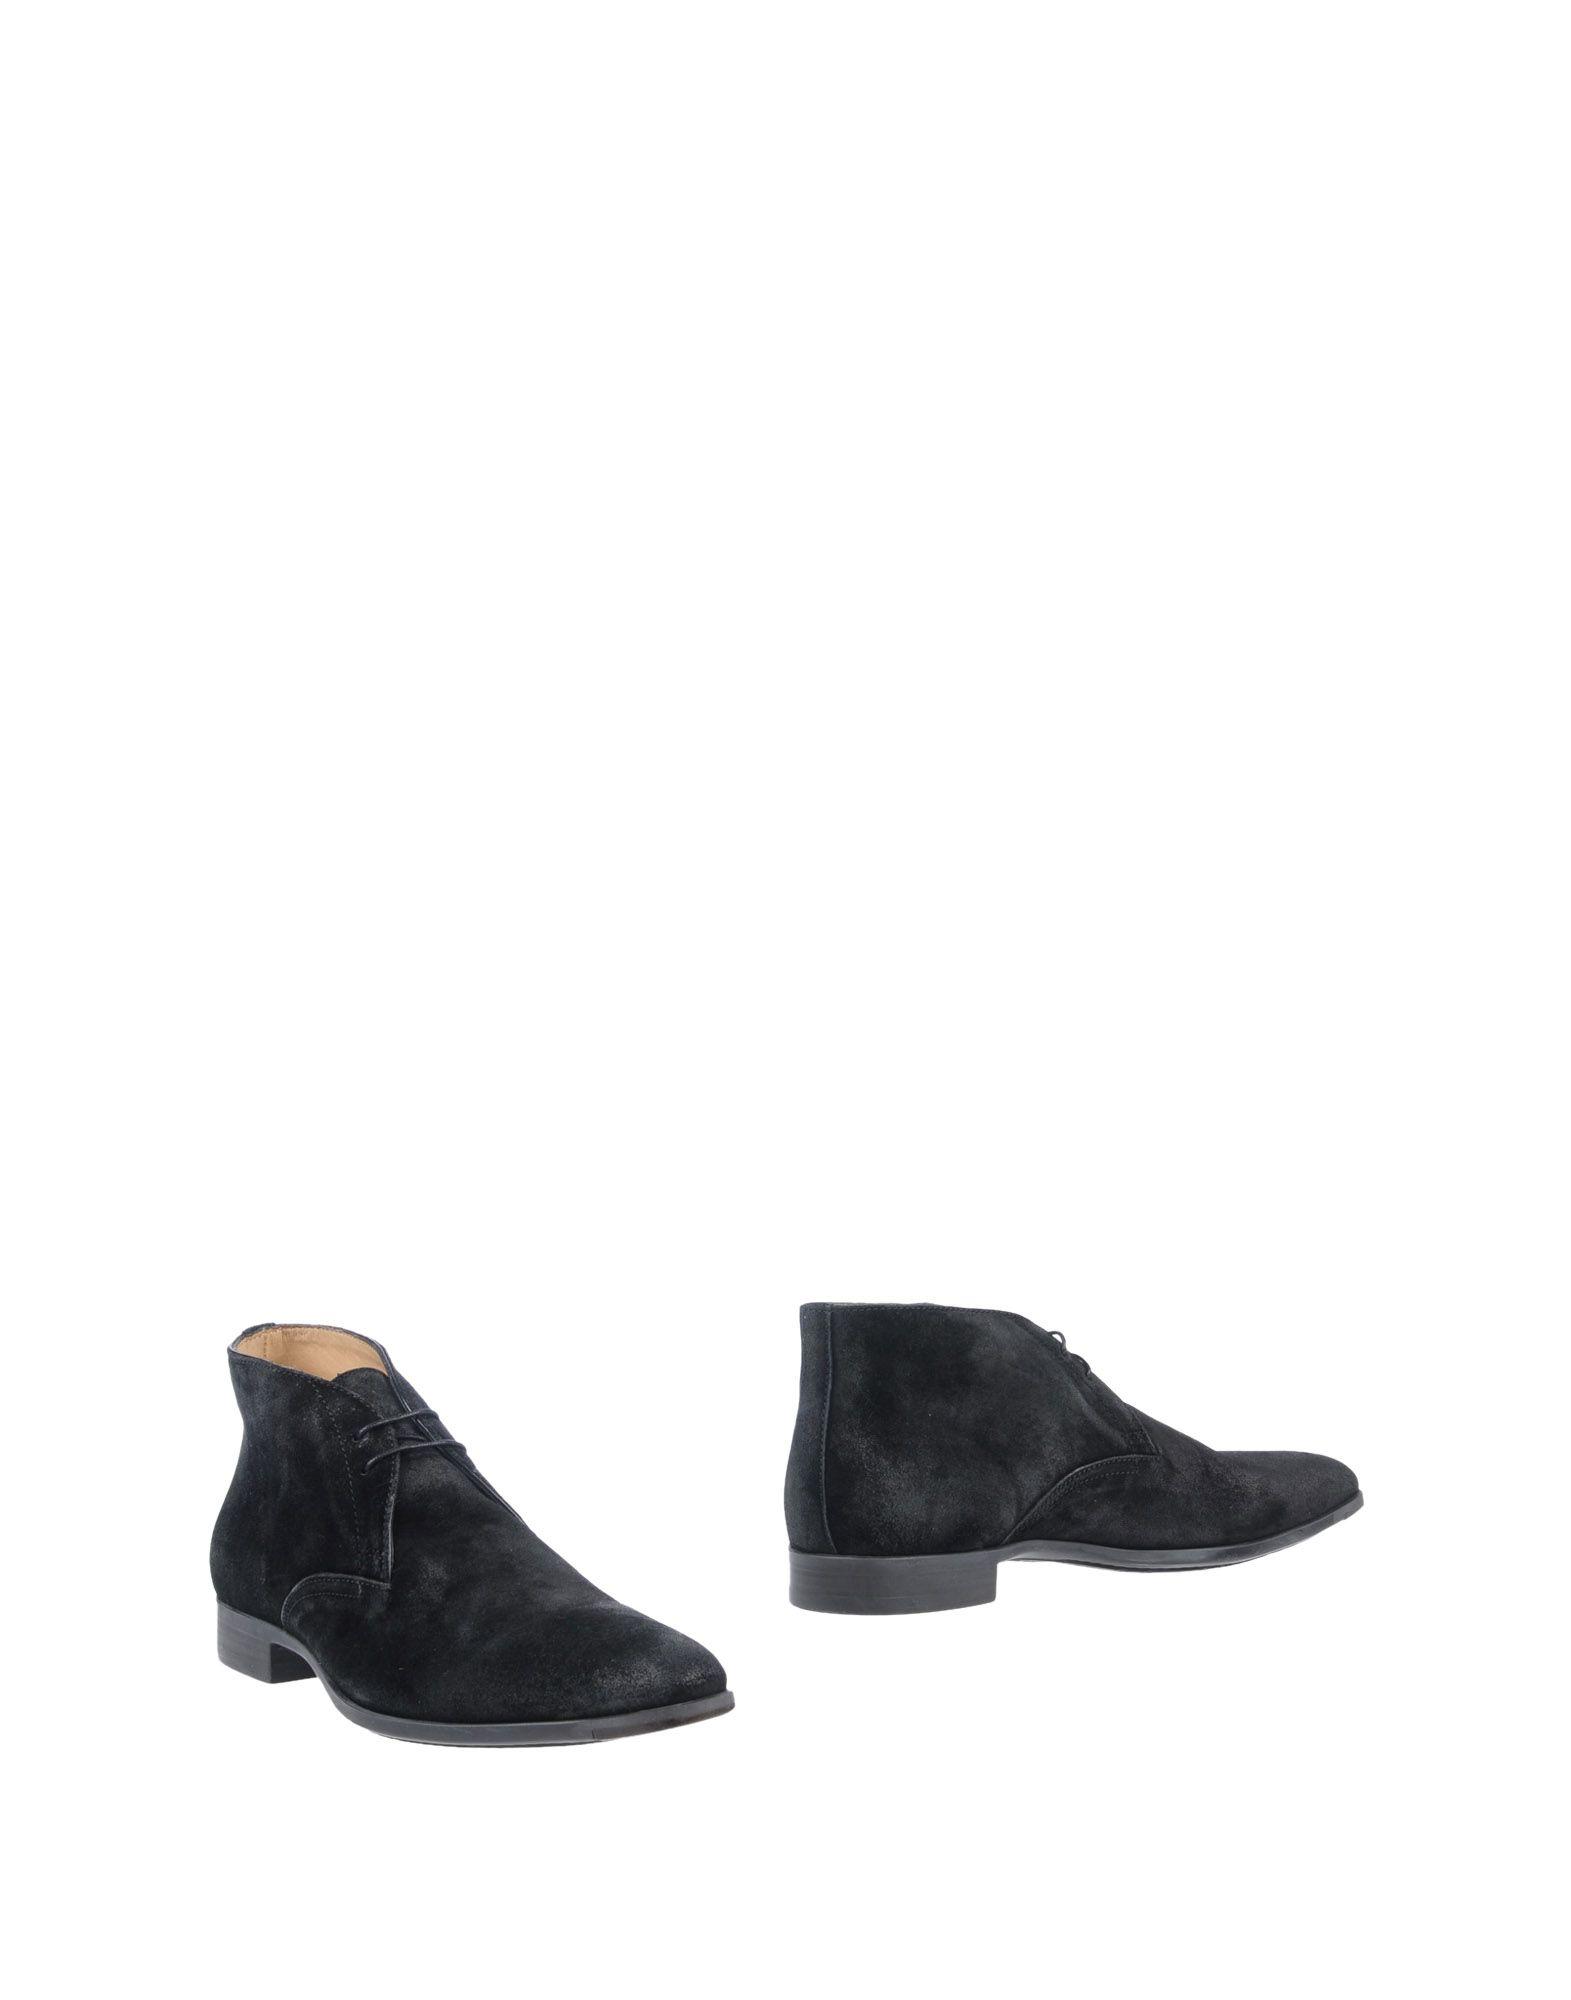 Santoni Gute Stiefelette Herren  11419040DI Gute Santoni Qualität beliebte Schuhe 9f5a83